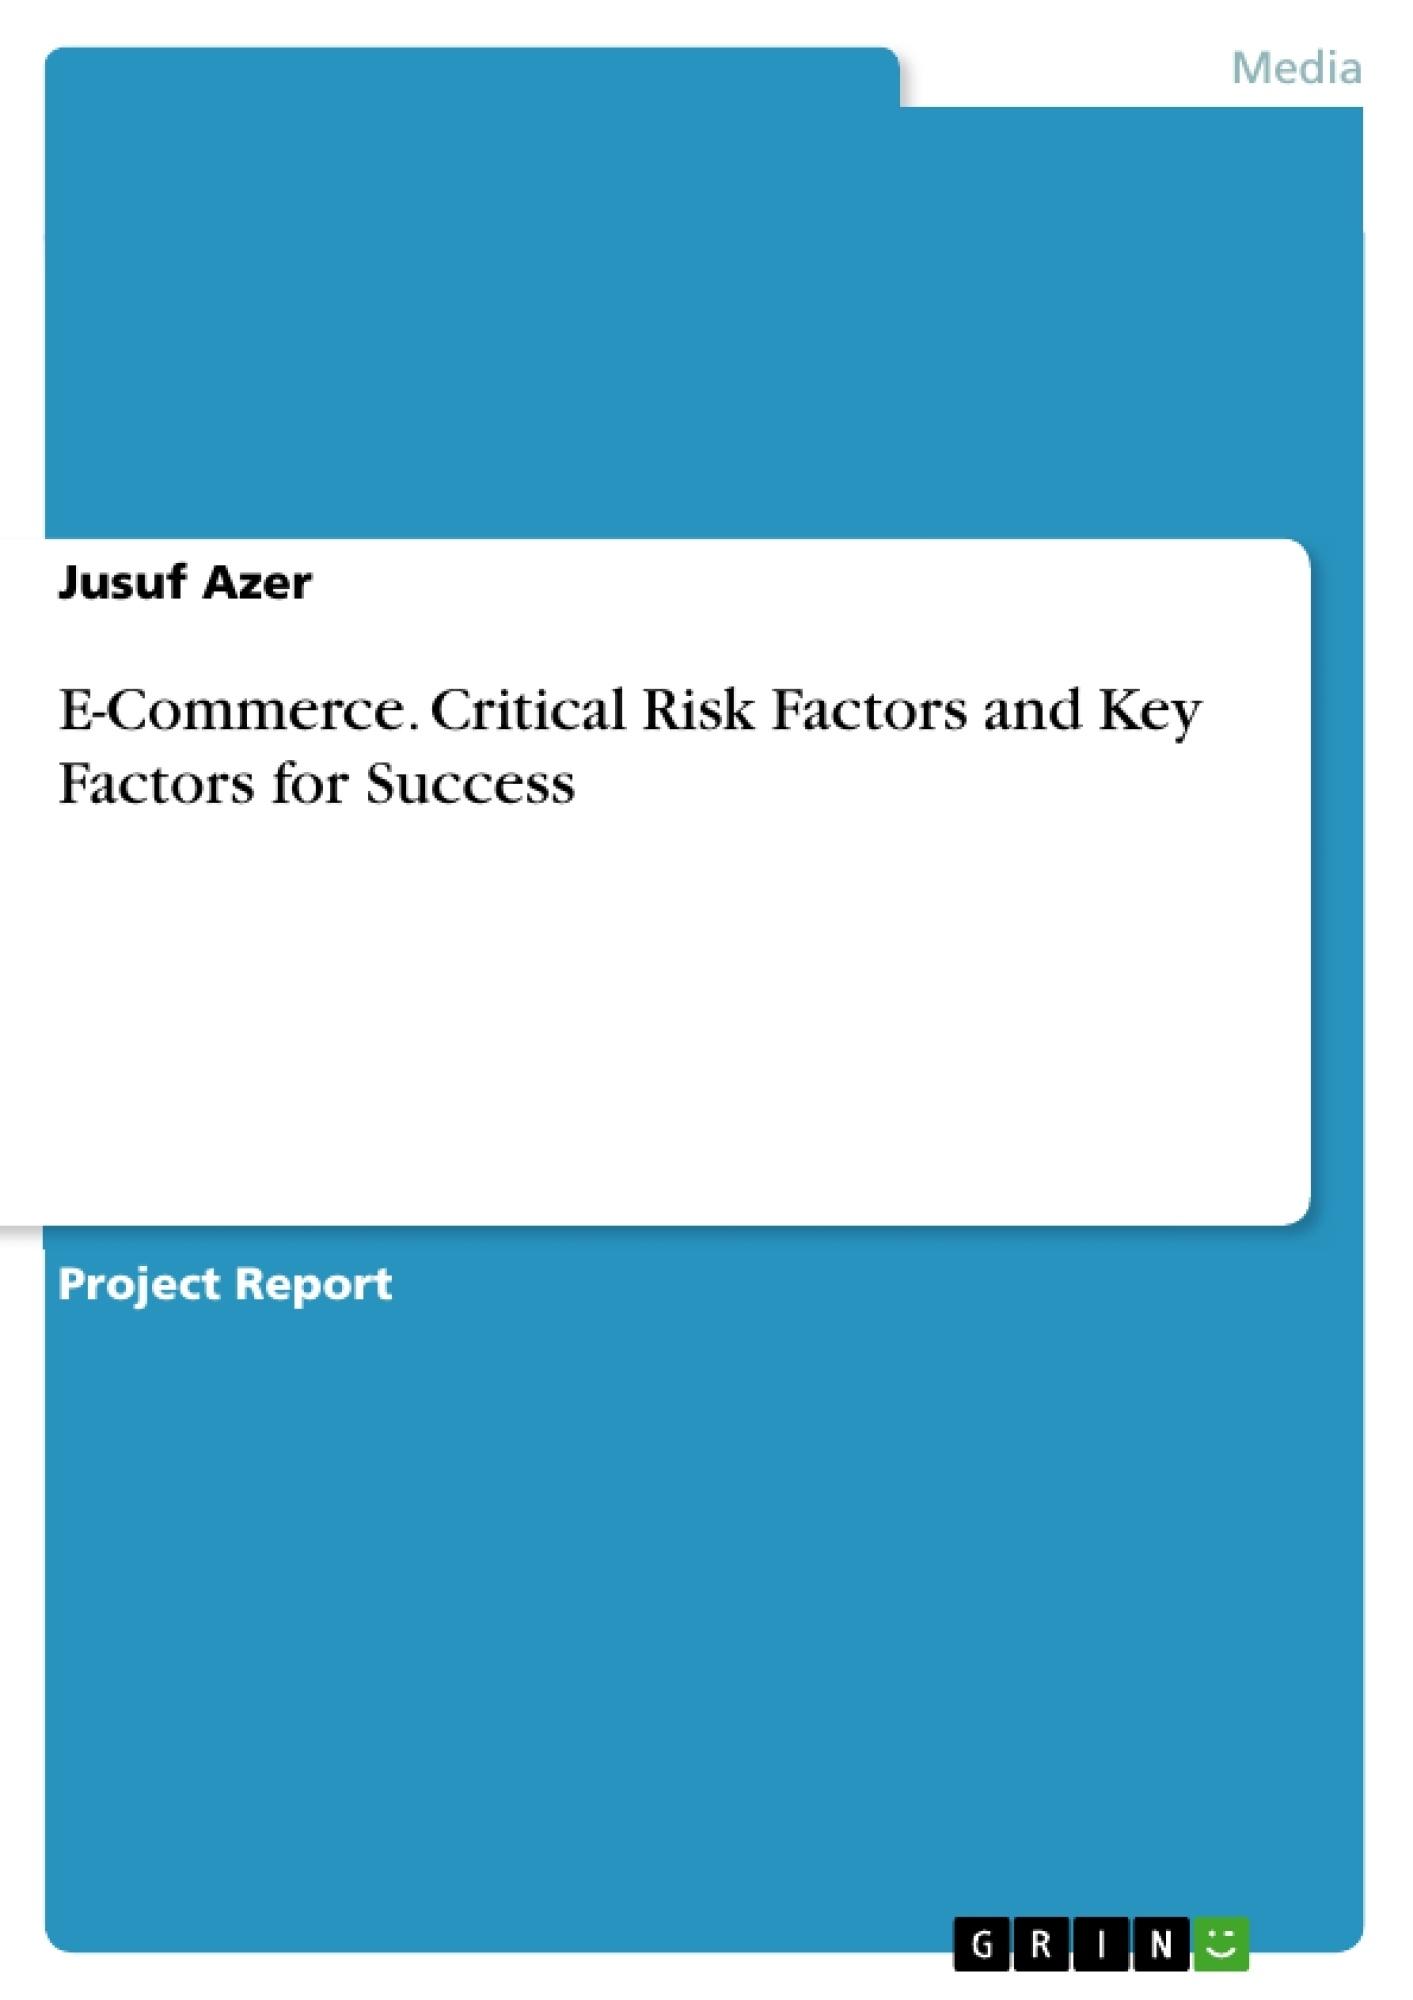 Title: E-Commerce. Critical Risk Factors and Key Factors for Success